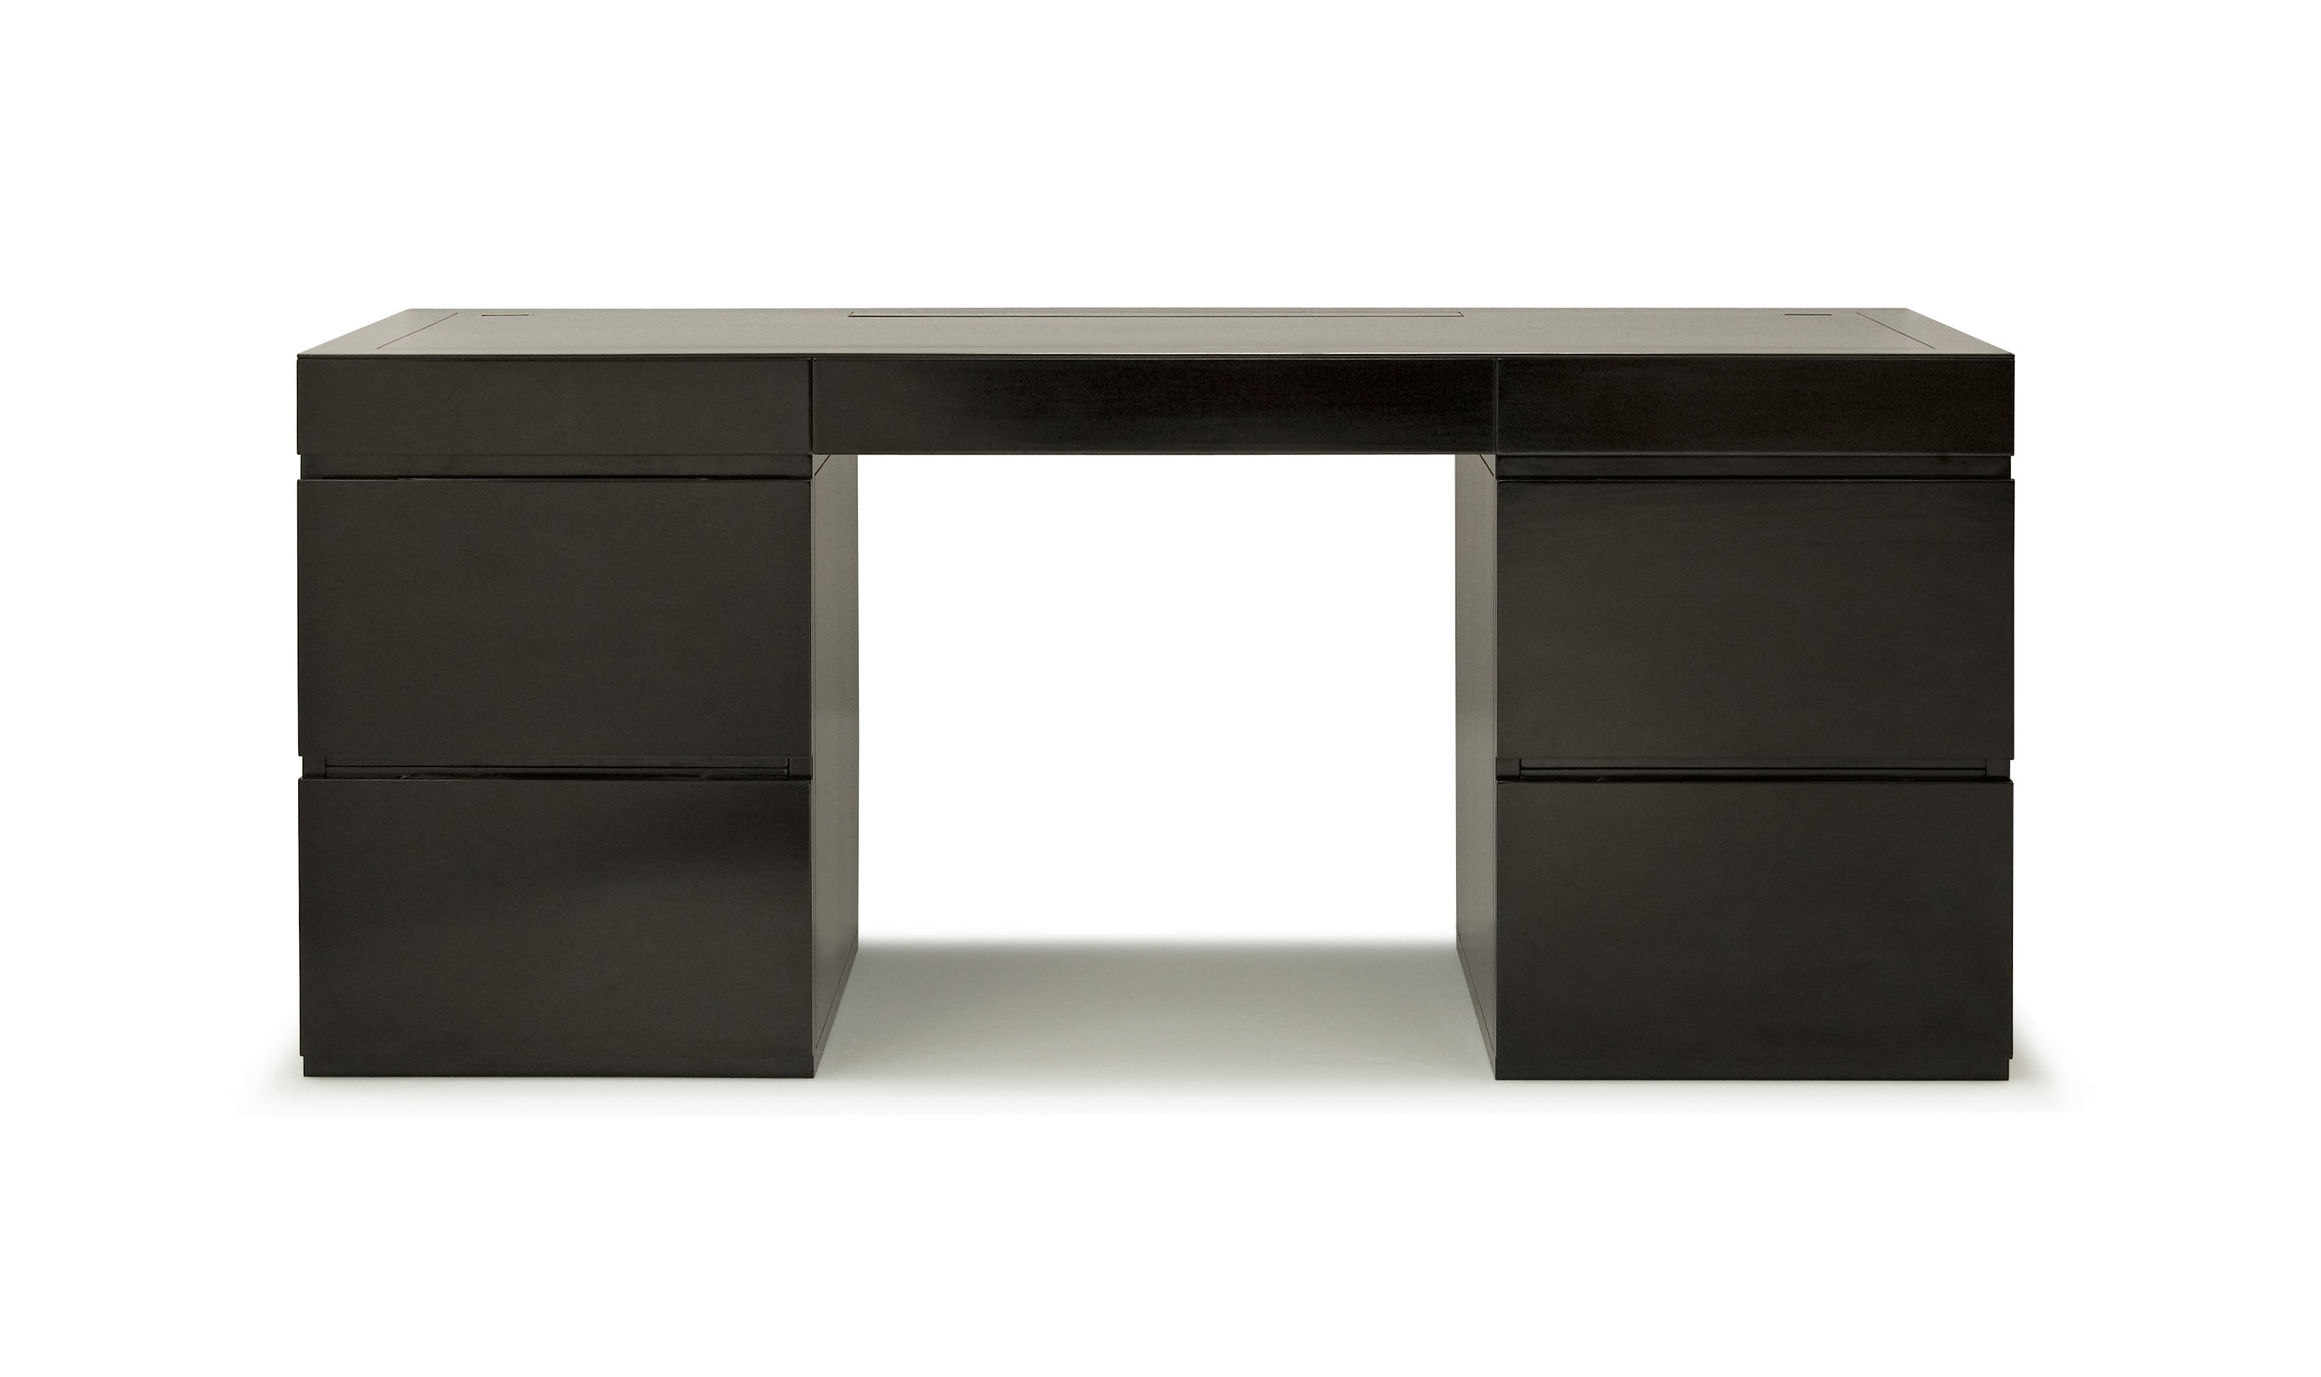 ....Bespoke Modern furniture : Trestle Desk..特别定制现代家具: 台架式书桌....